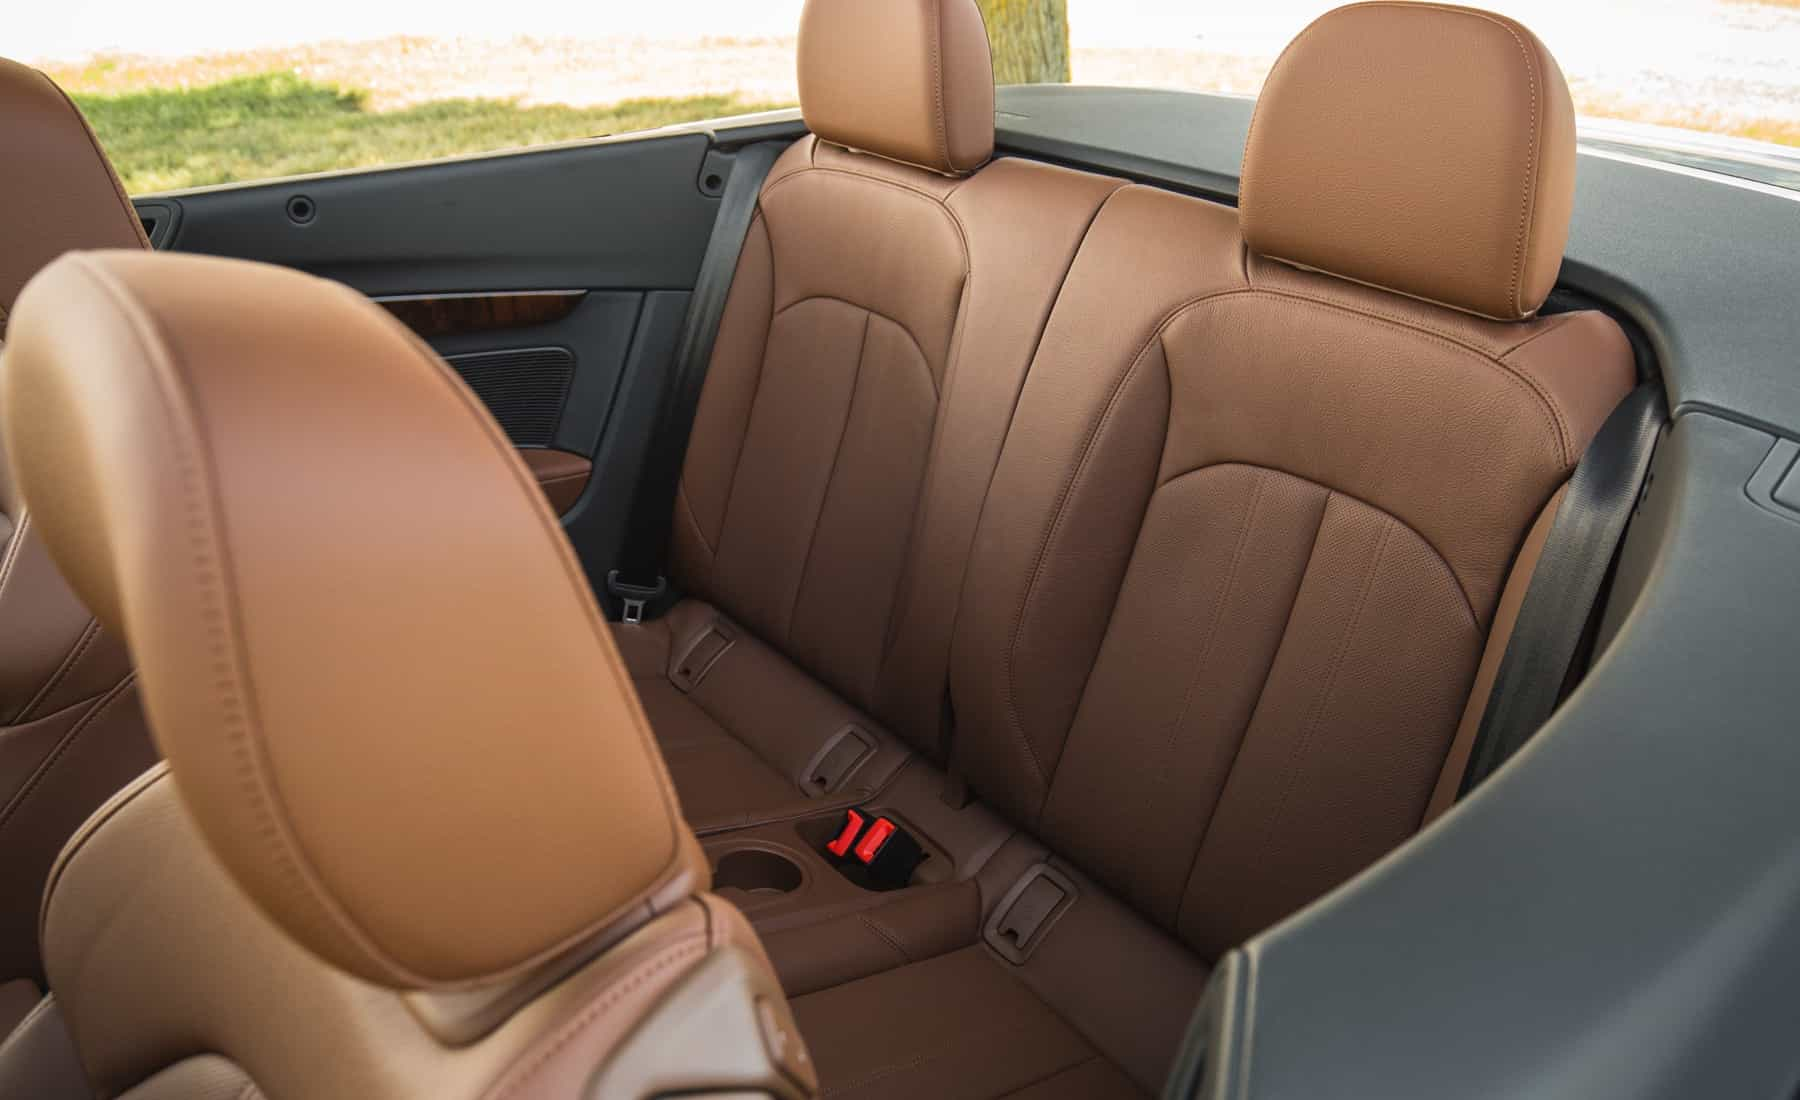 2018 Audi A5 Cabriolet Interior Seats Rear (Photo 27 of 45)